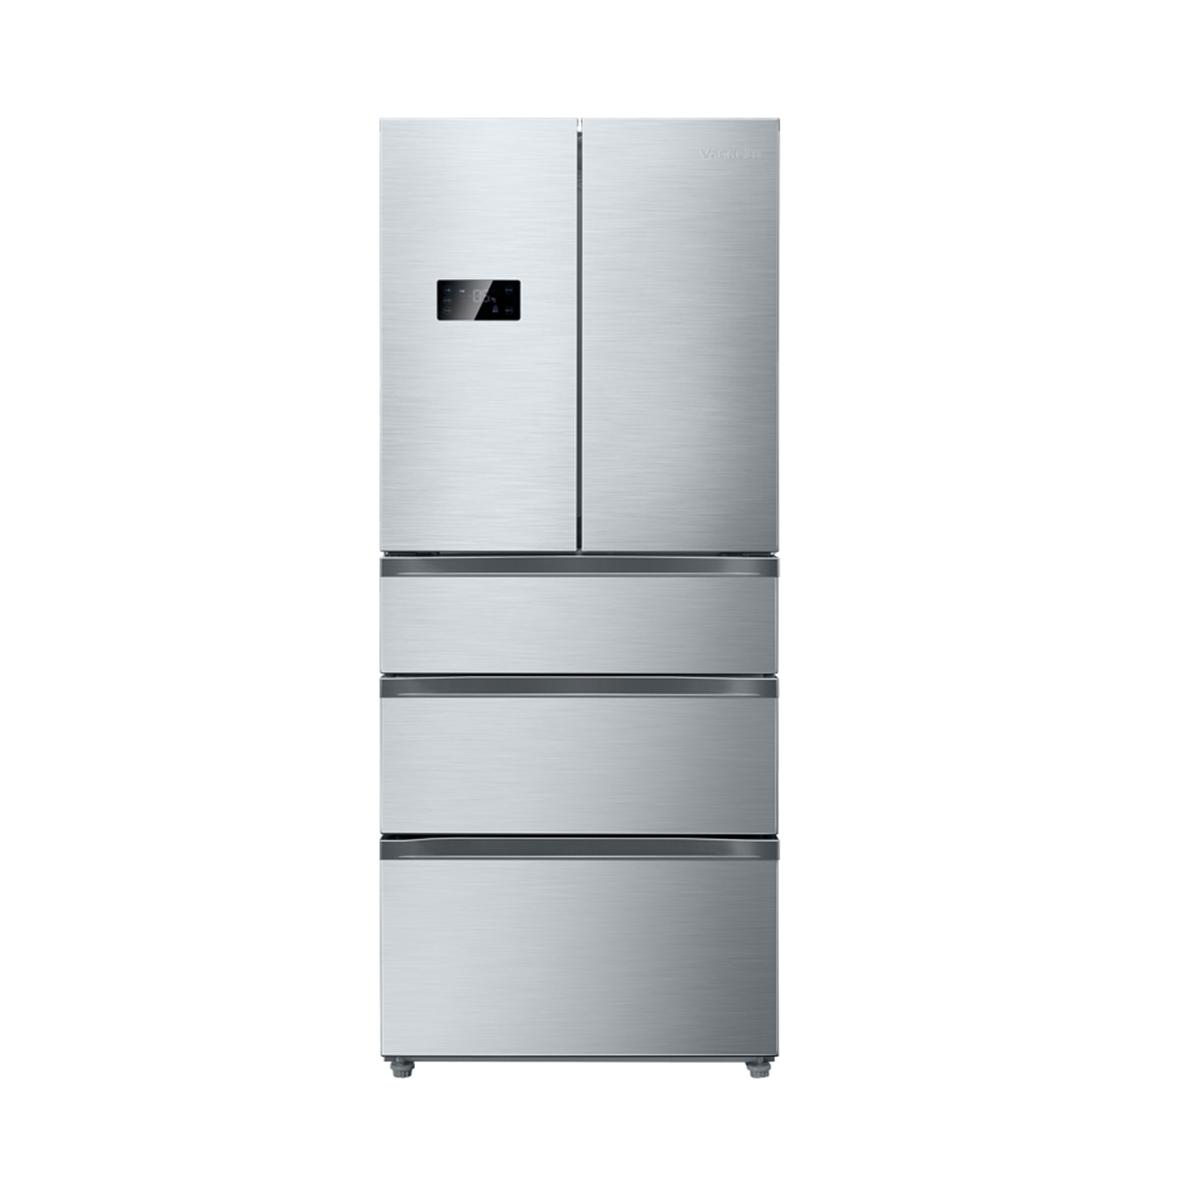 Midea/美的 BCD-330WTZV冰箱 说明书.pdf